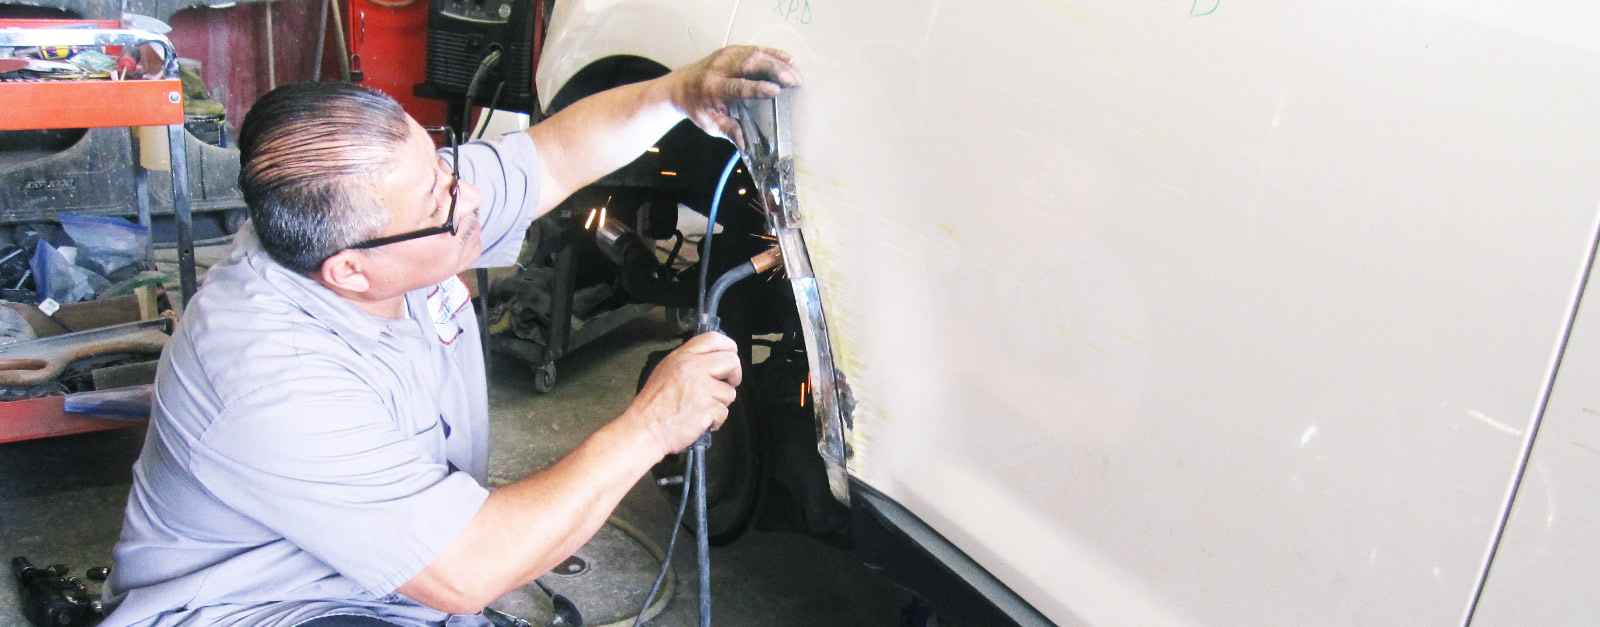 Auto Body Repair Shop & Collision Center Los Angeles